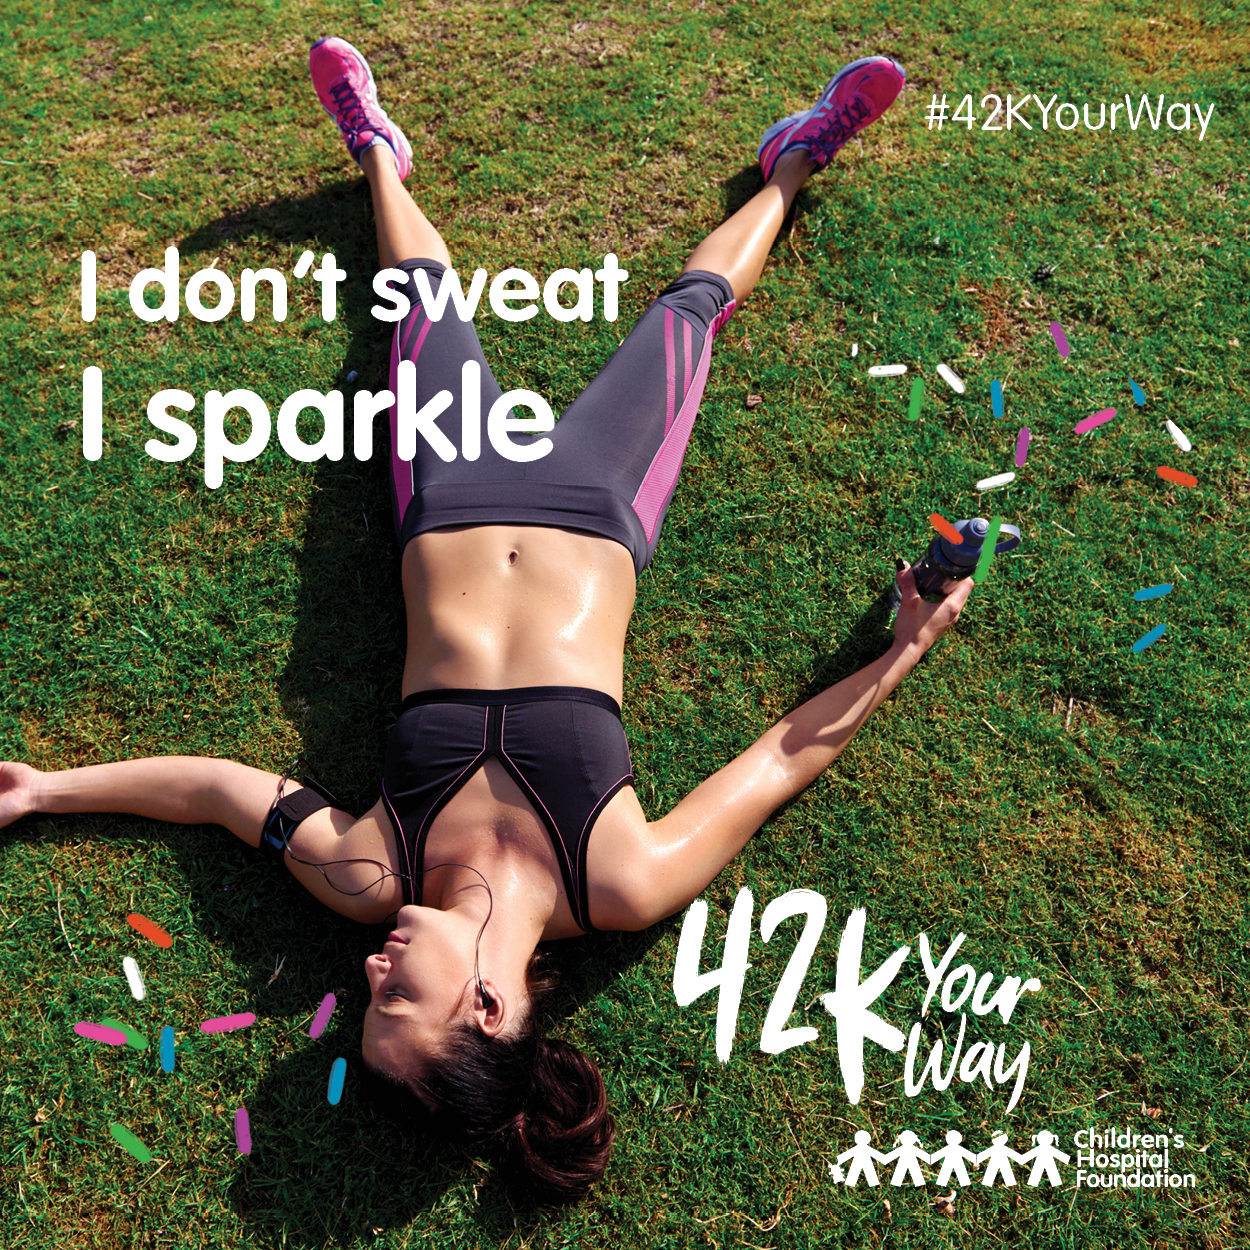 42k Your Way - I Don't Sweat I Sparkle